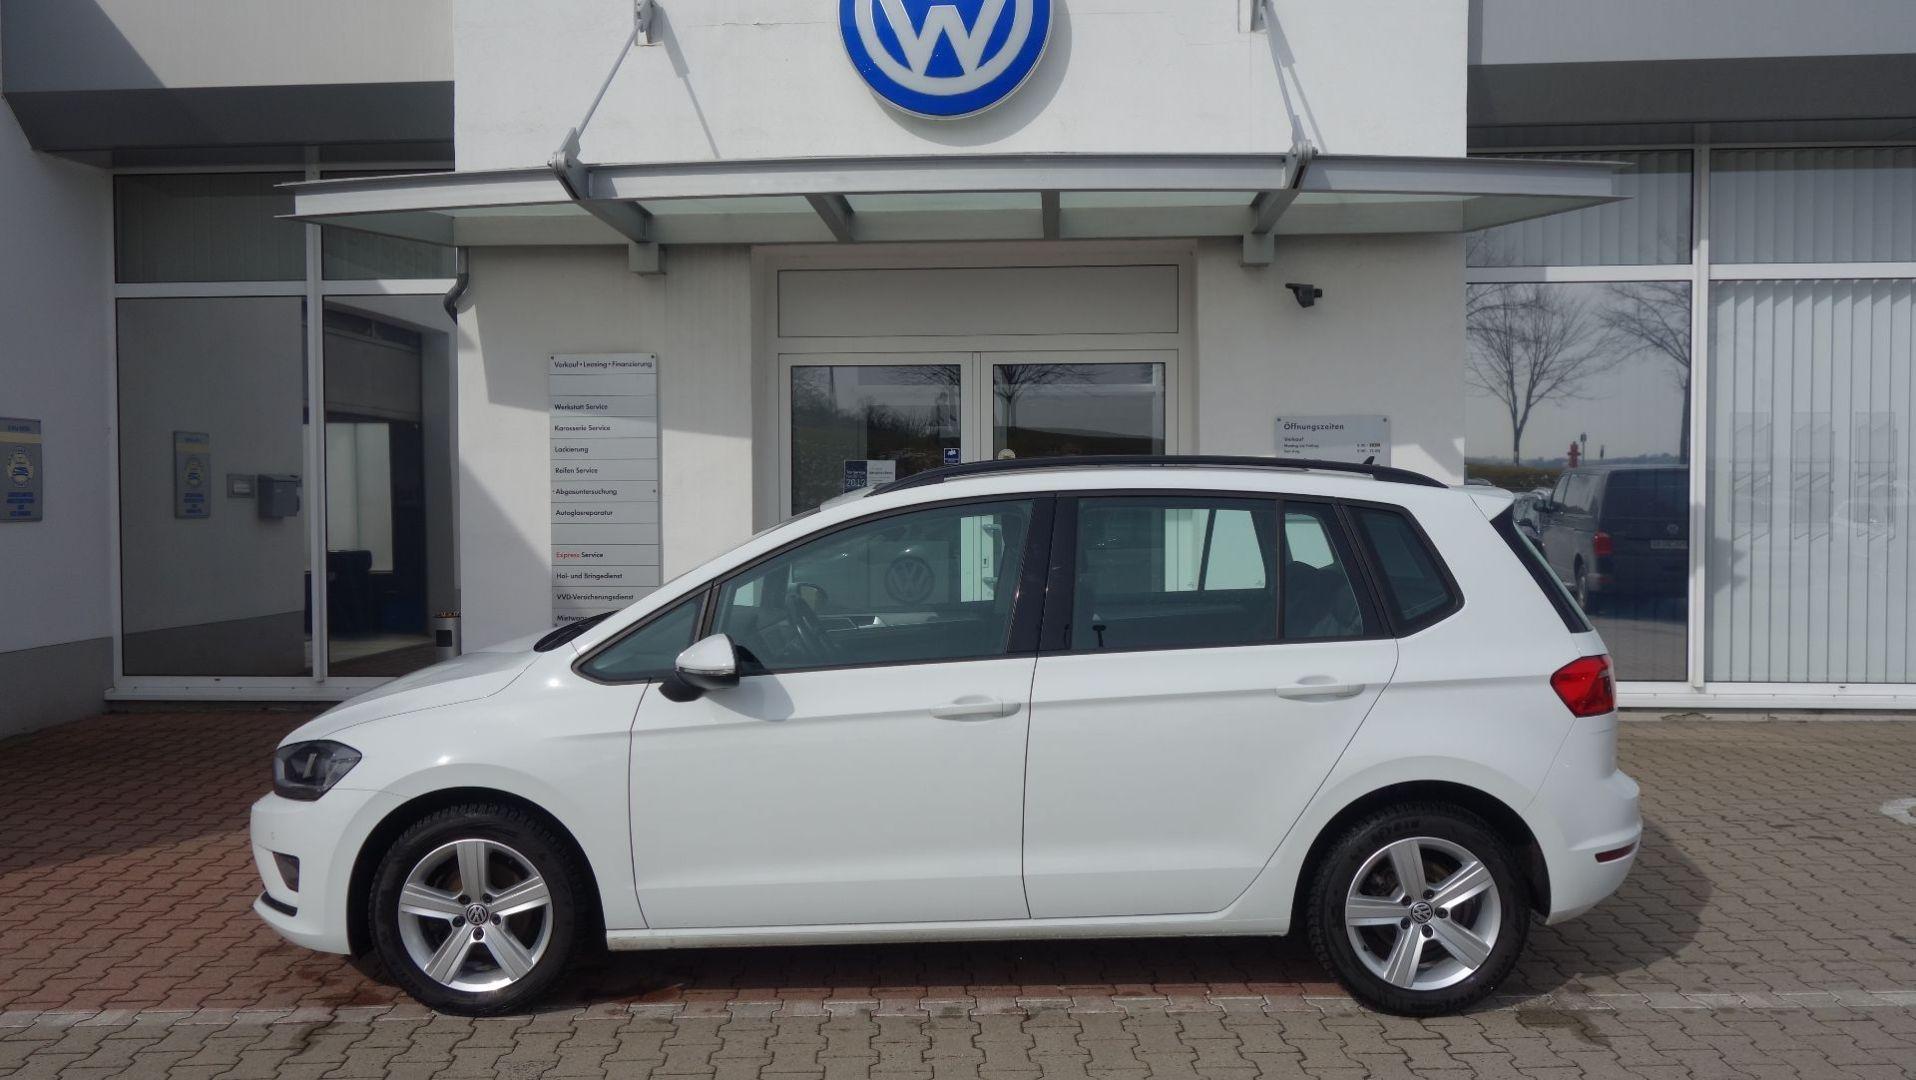 Volkswagen Golf Sportsvan Comfortline 1.2 TSI Fahrschulwage, Jahr 2016, Benzin